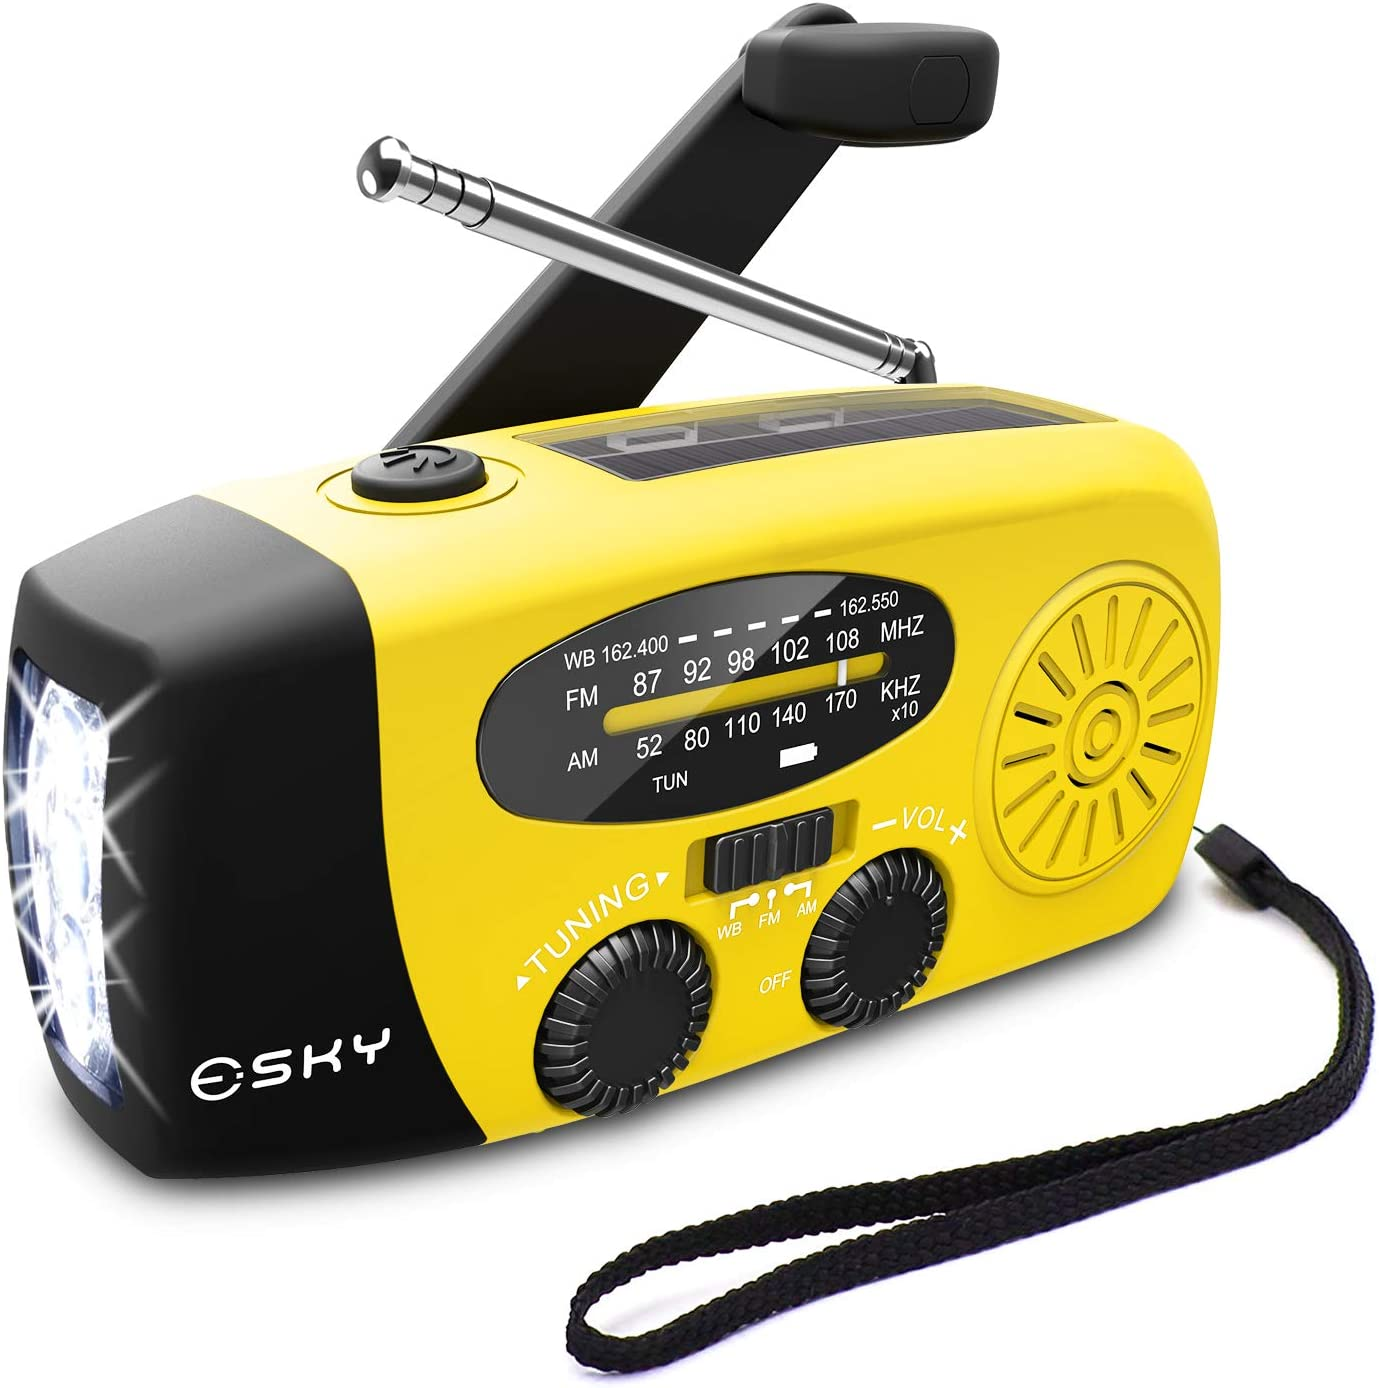 Esky Emergency Radio